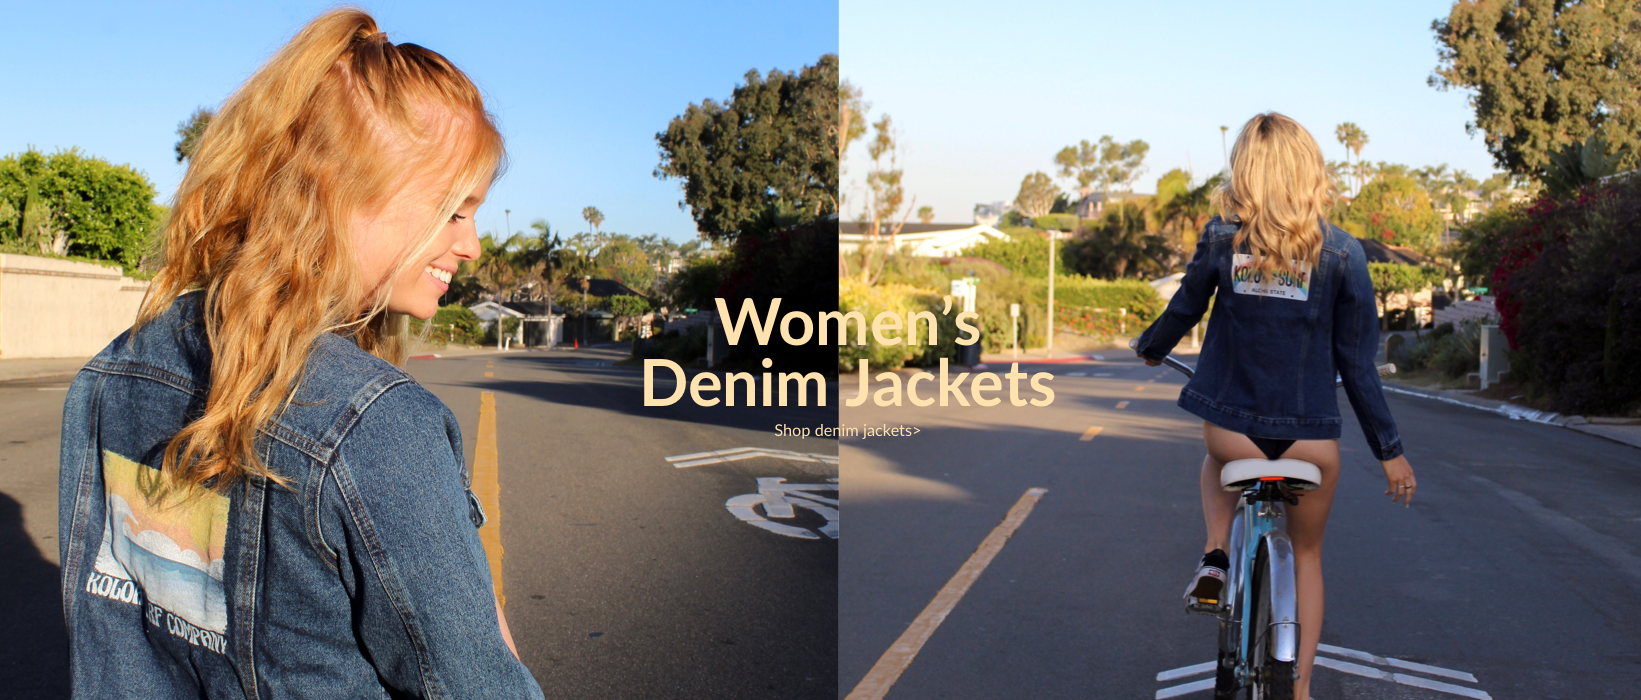 Koloa Surf Company Women's Denim Jacket. Shop the new women's collection now.